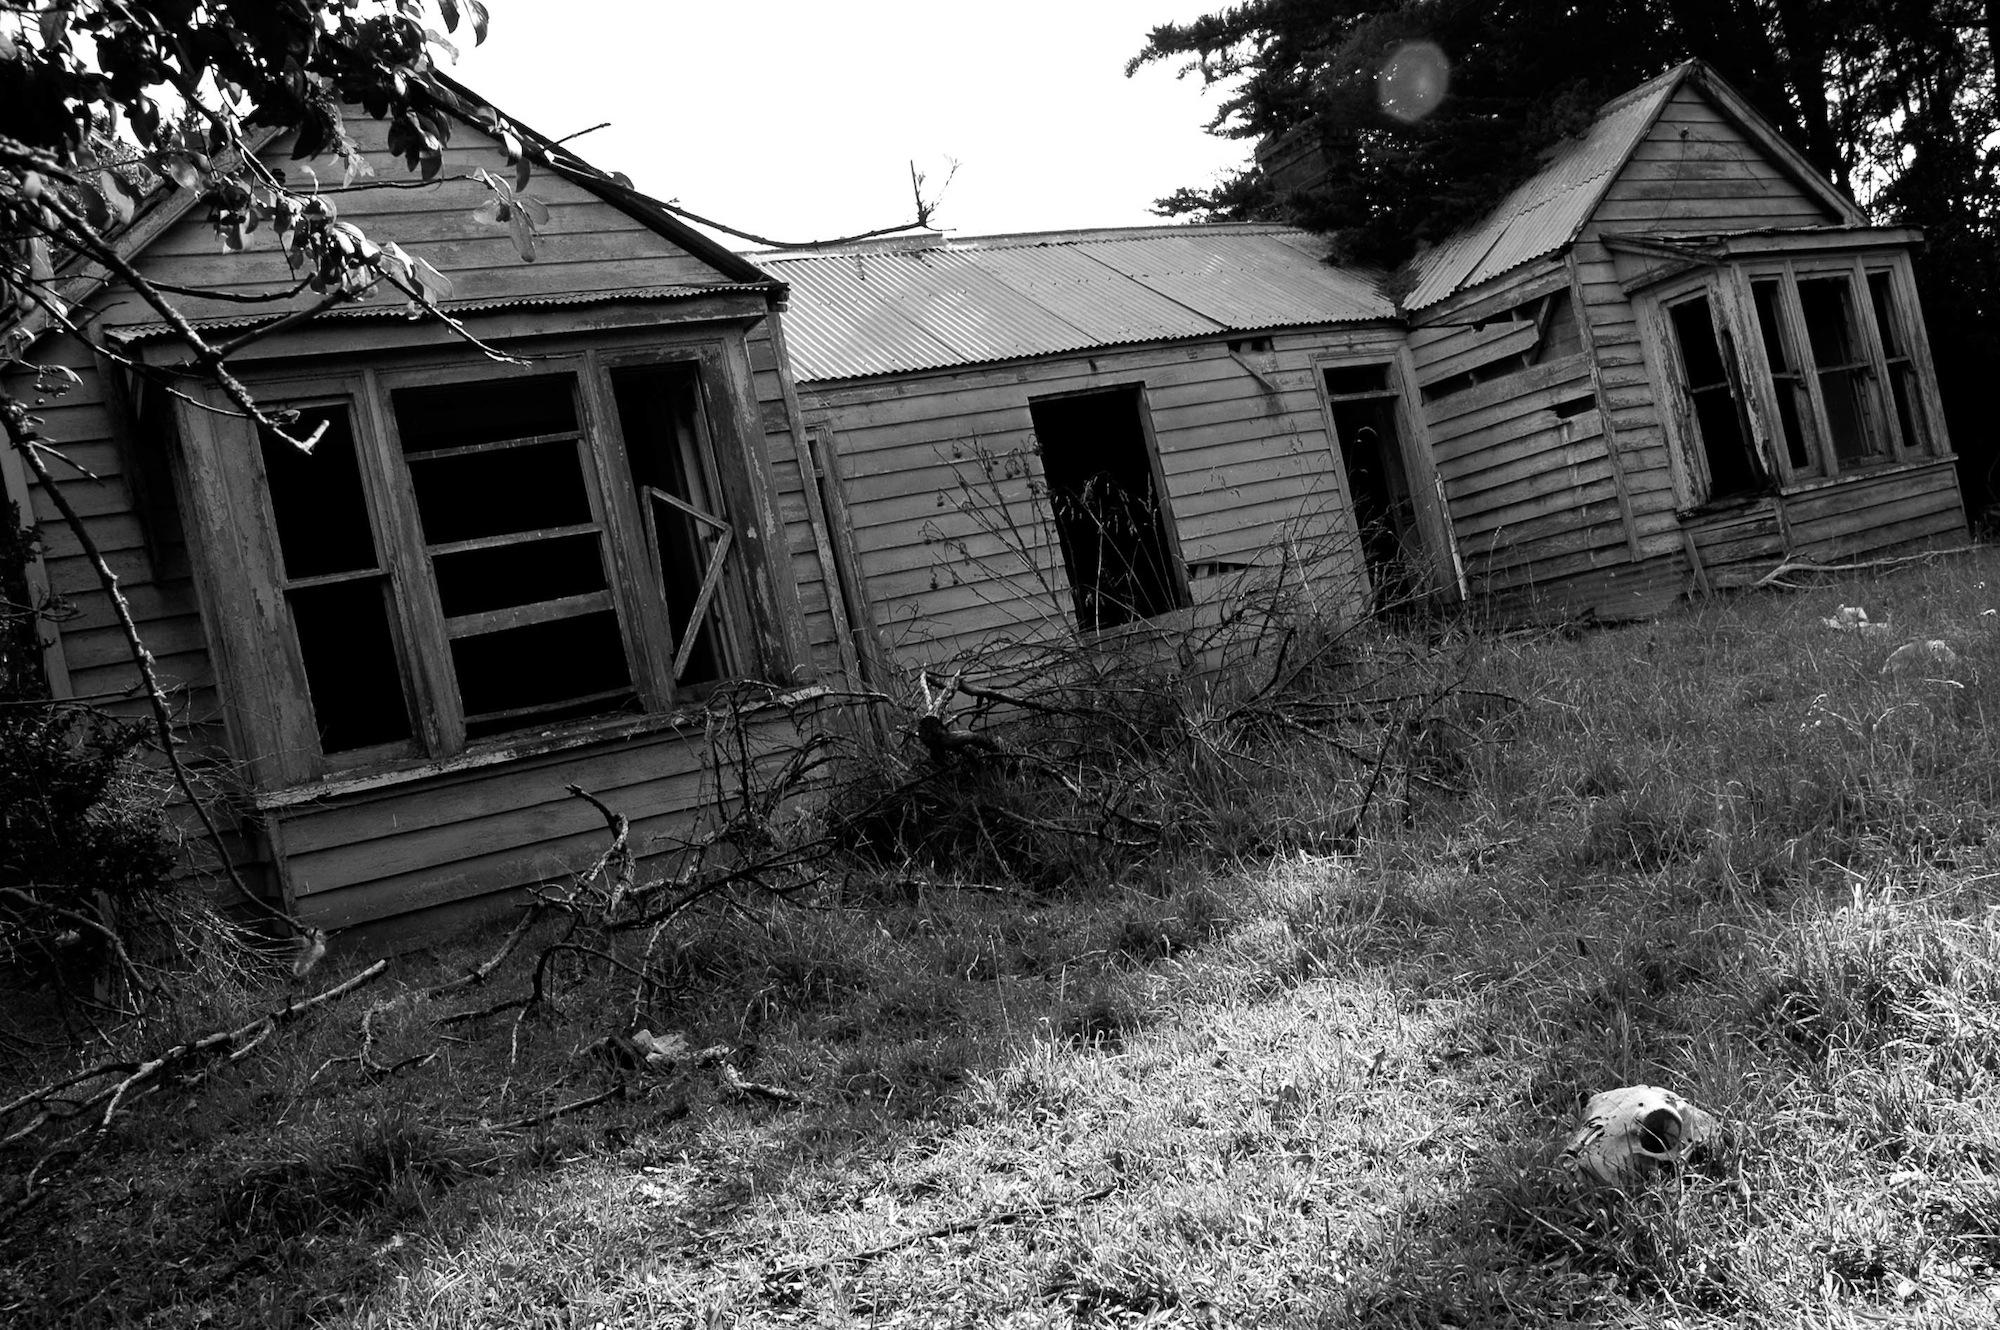 abandoned_house_new zealand_ben_howe_8.jpg